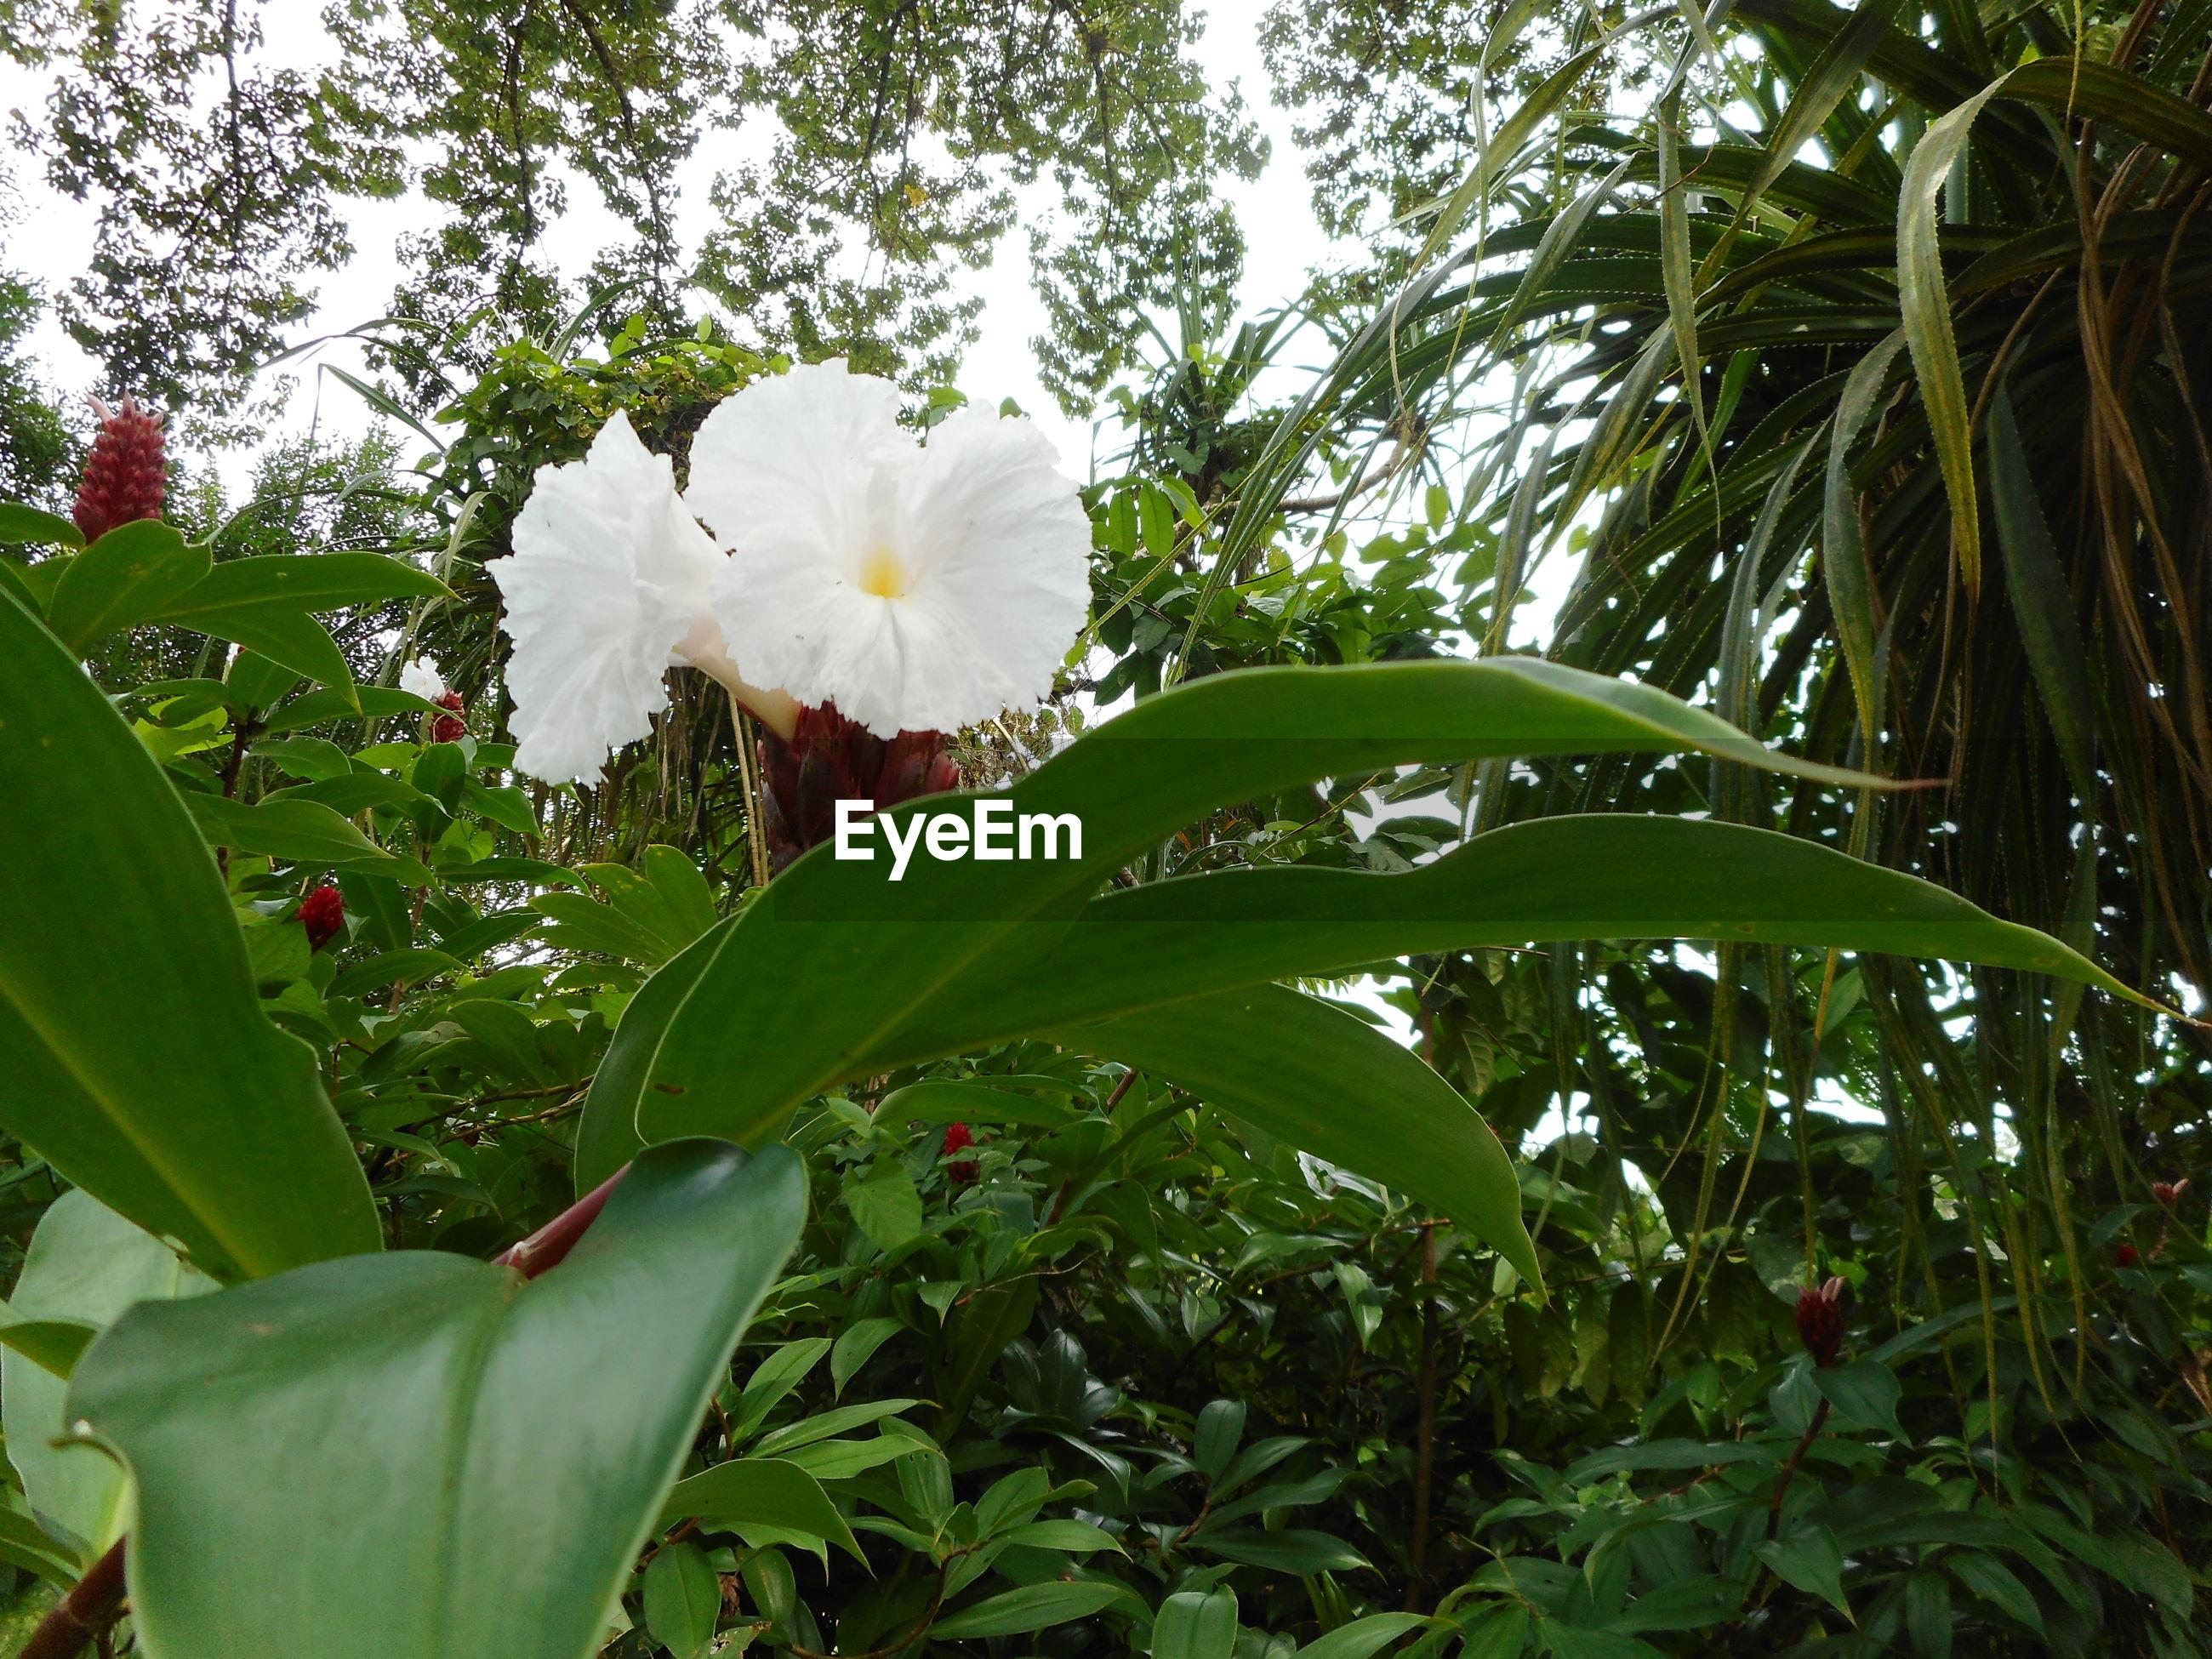 CLOSE-UP OF WHITE FRANGIPANI BLOOMING ON TREE